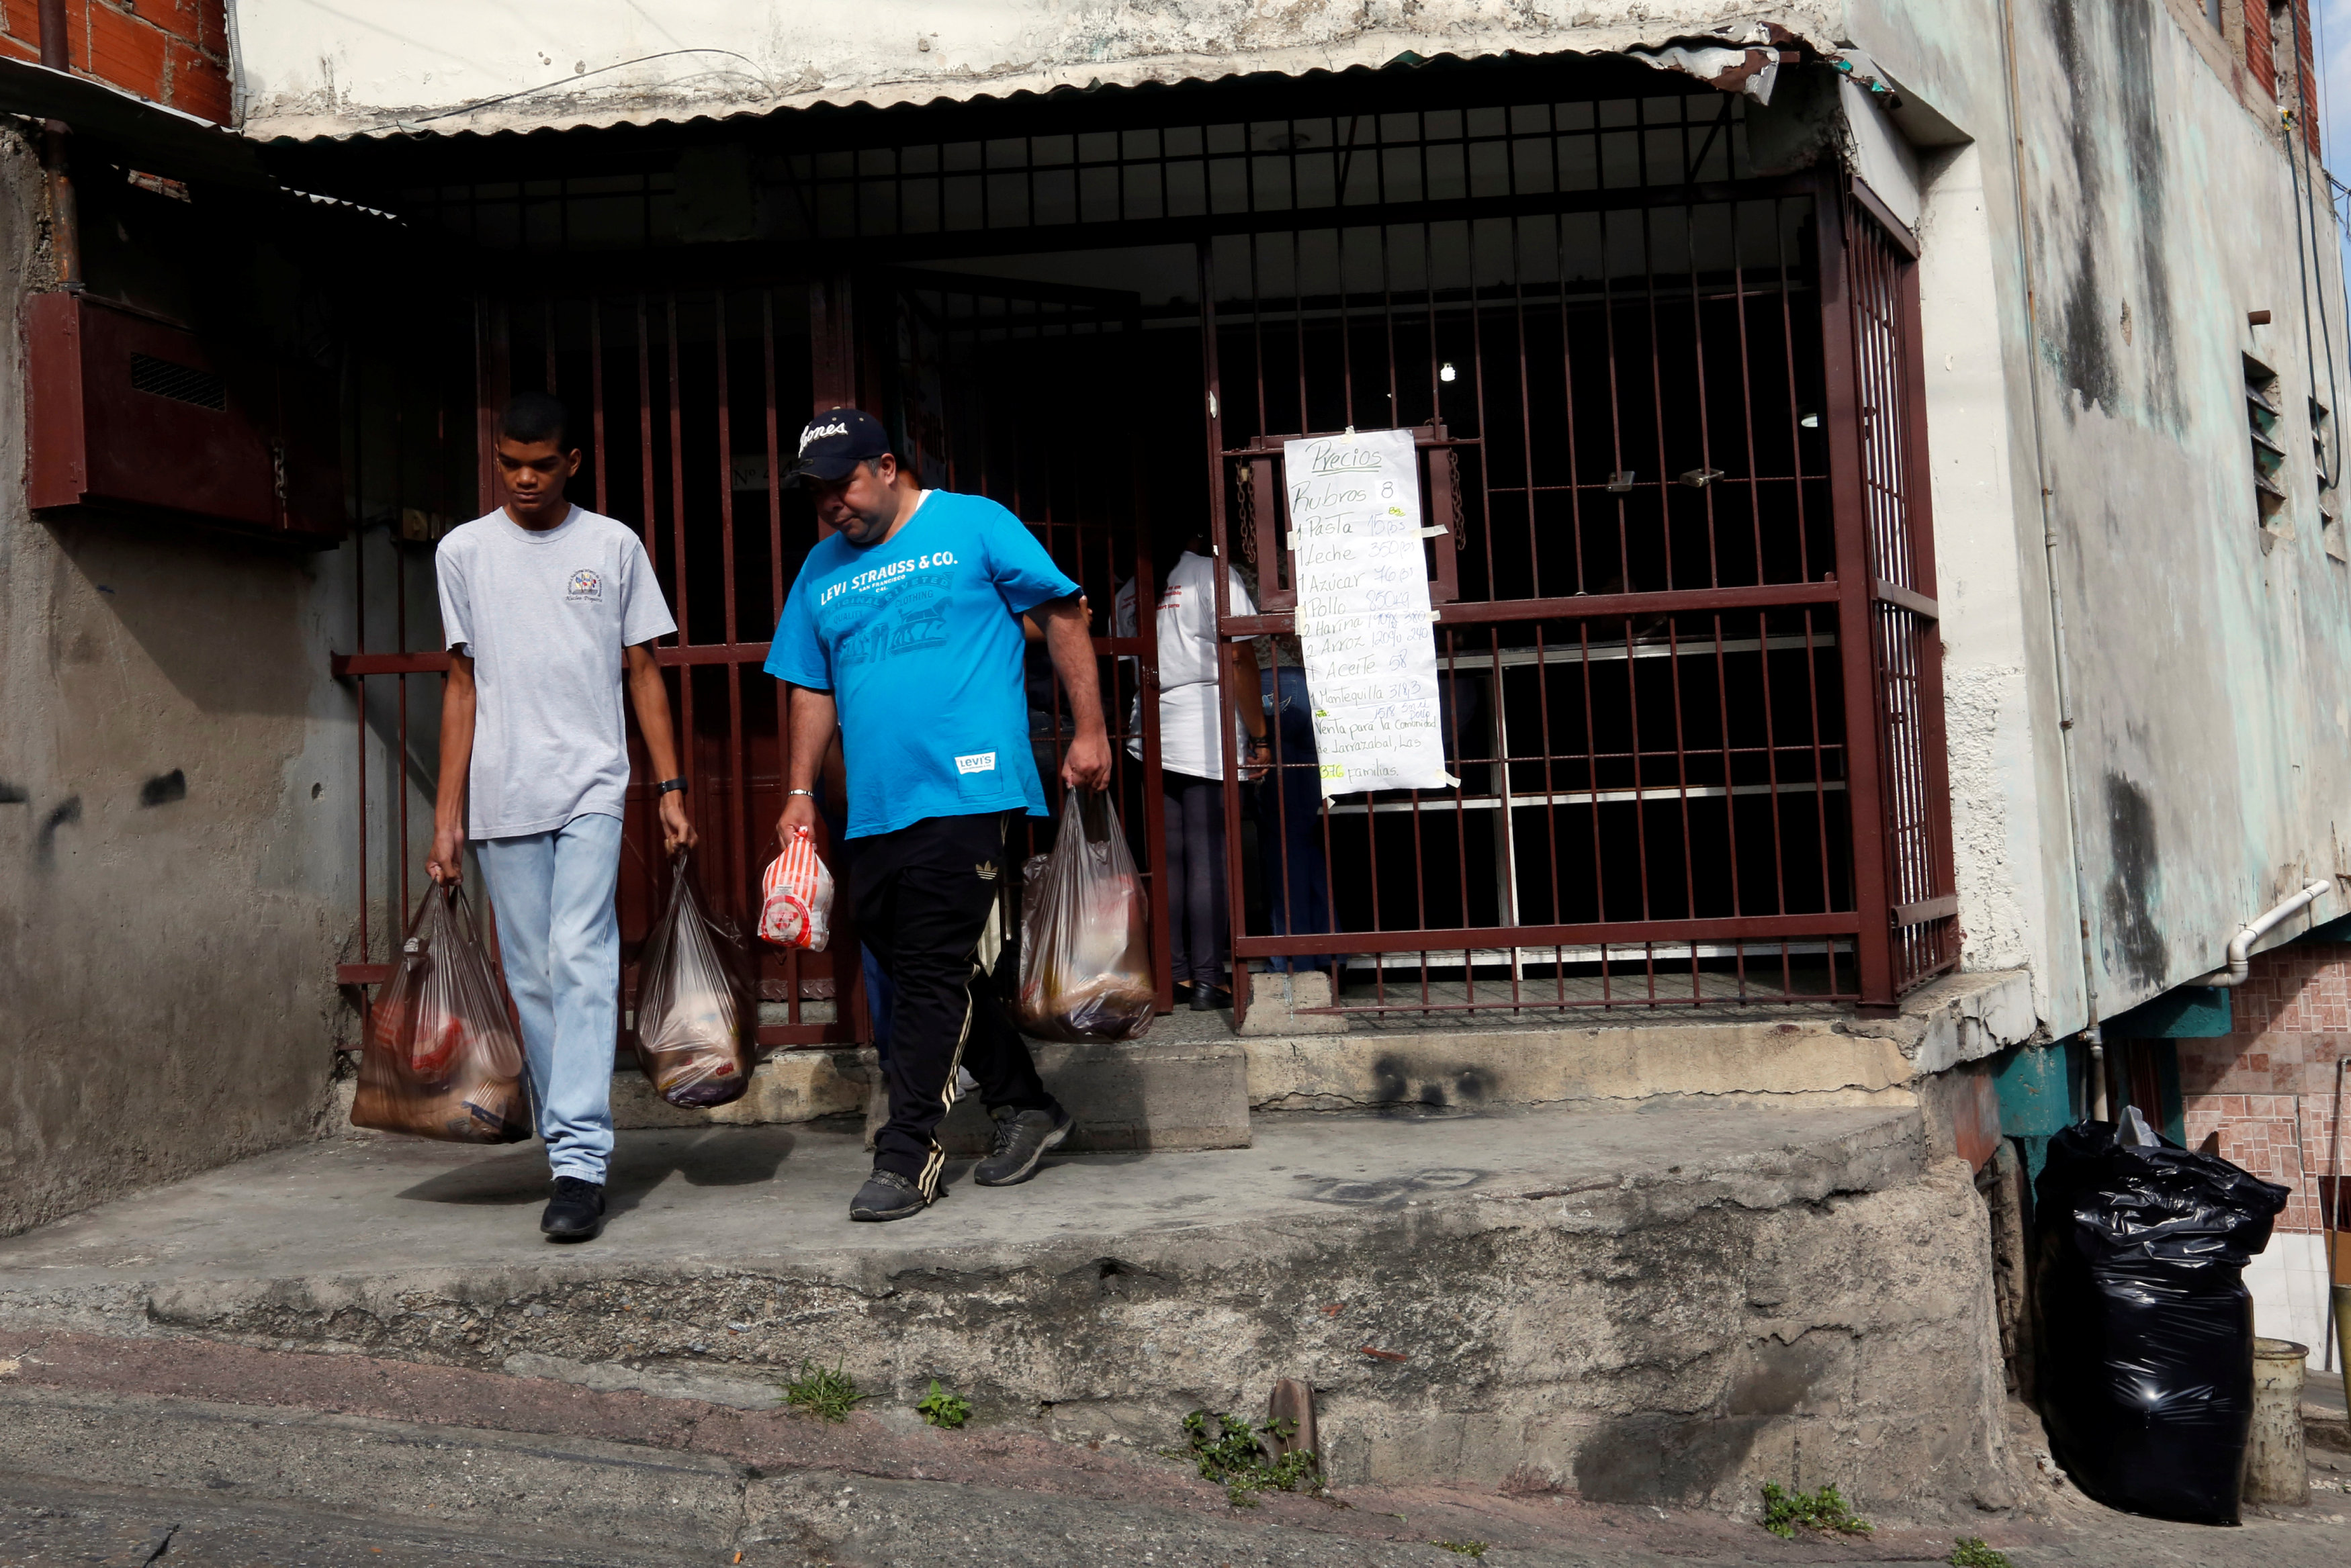 Residentes salen de un centro comunitario con bolsas de alimentos que compraron a bajo precio REUTERS/Carlos Jasso